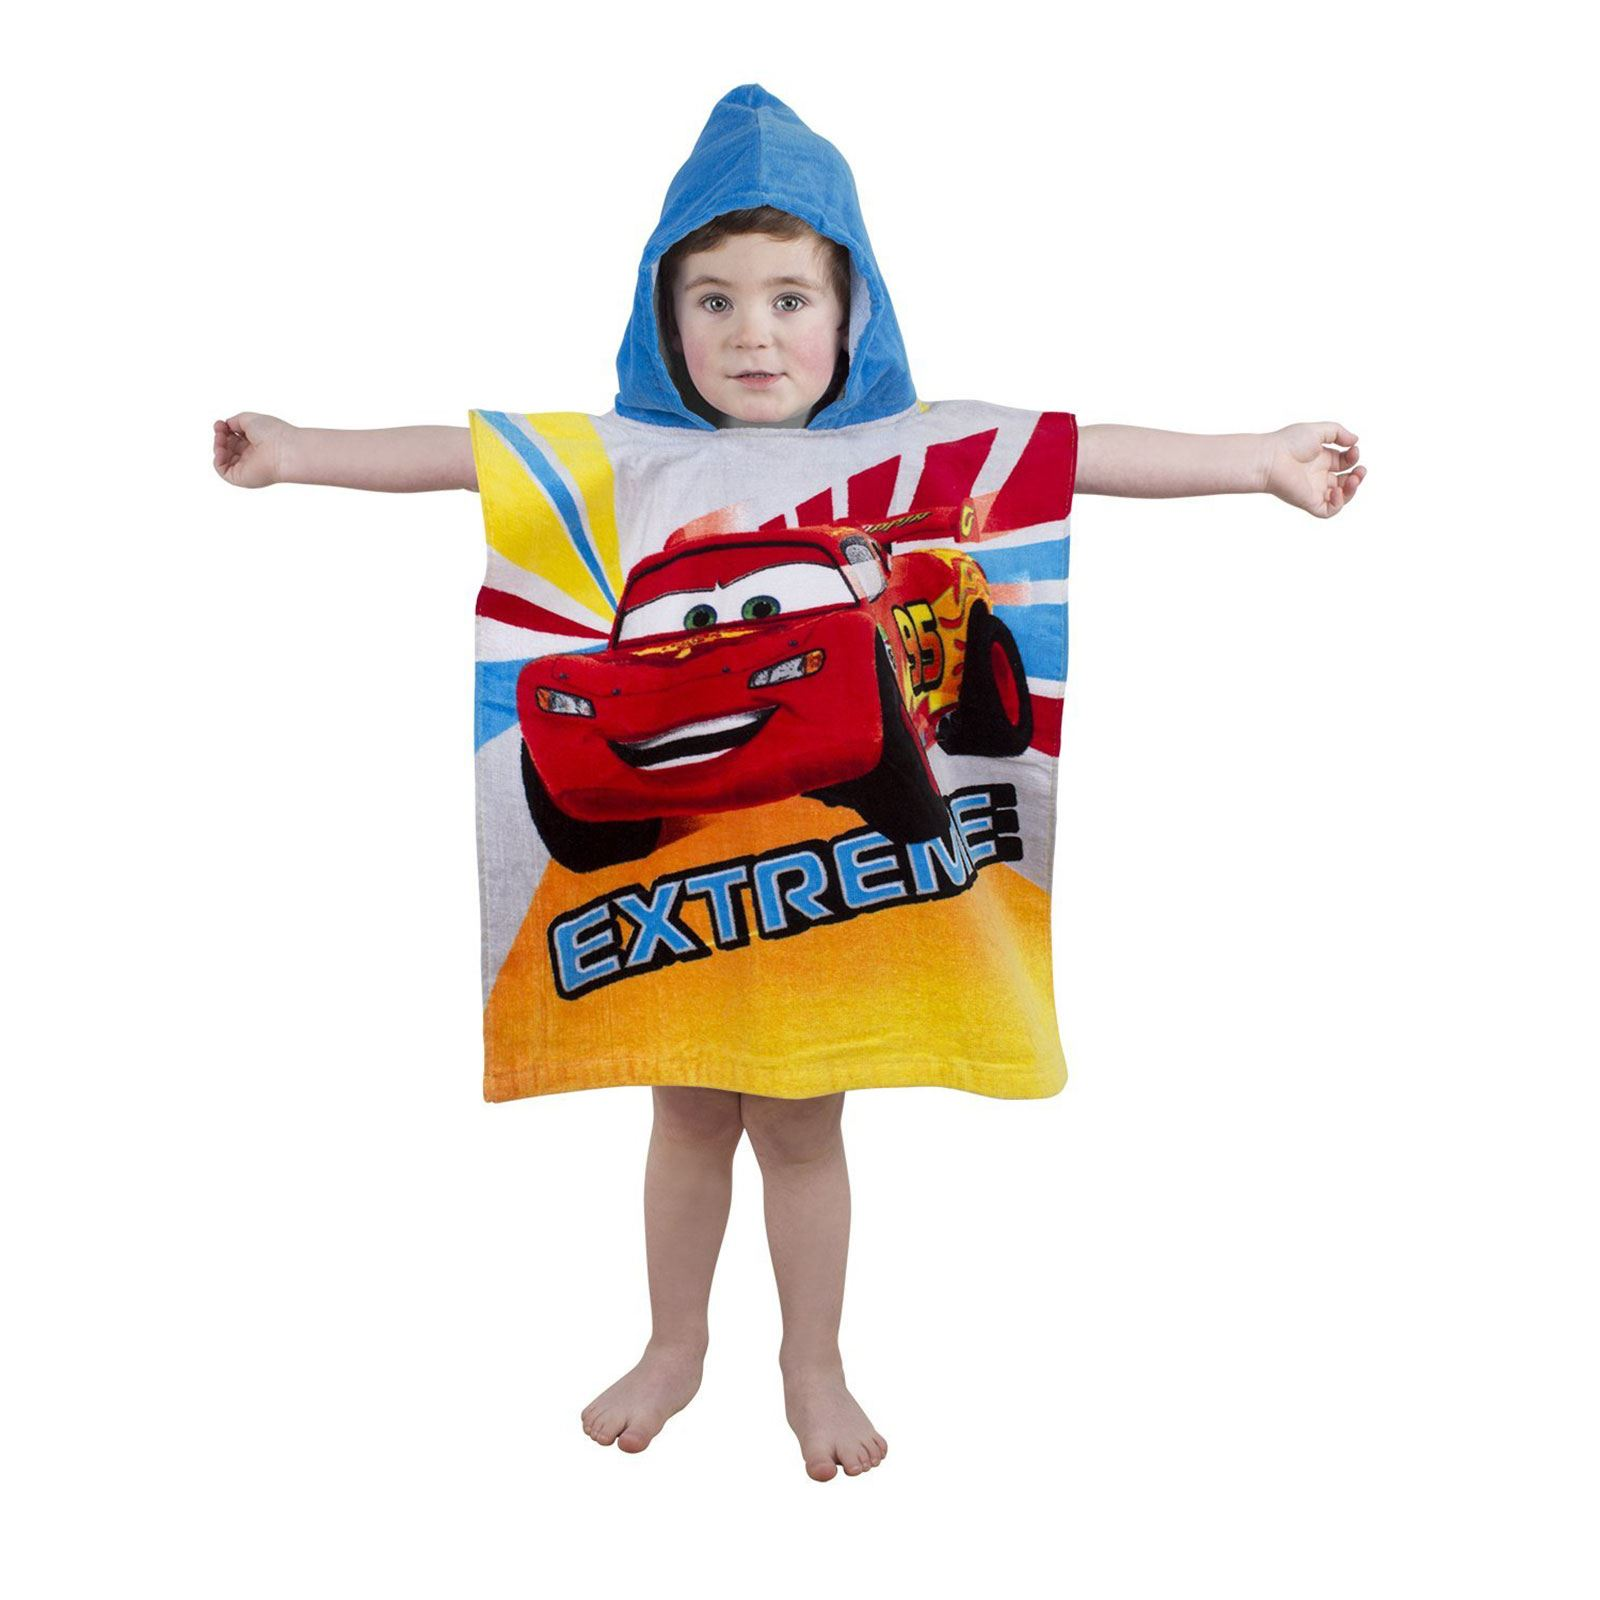 Poncho Baño Infantil:Hooded Poncho Towel